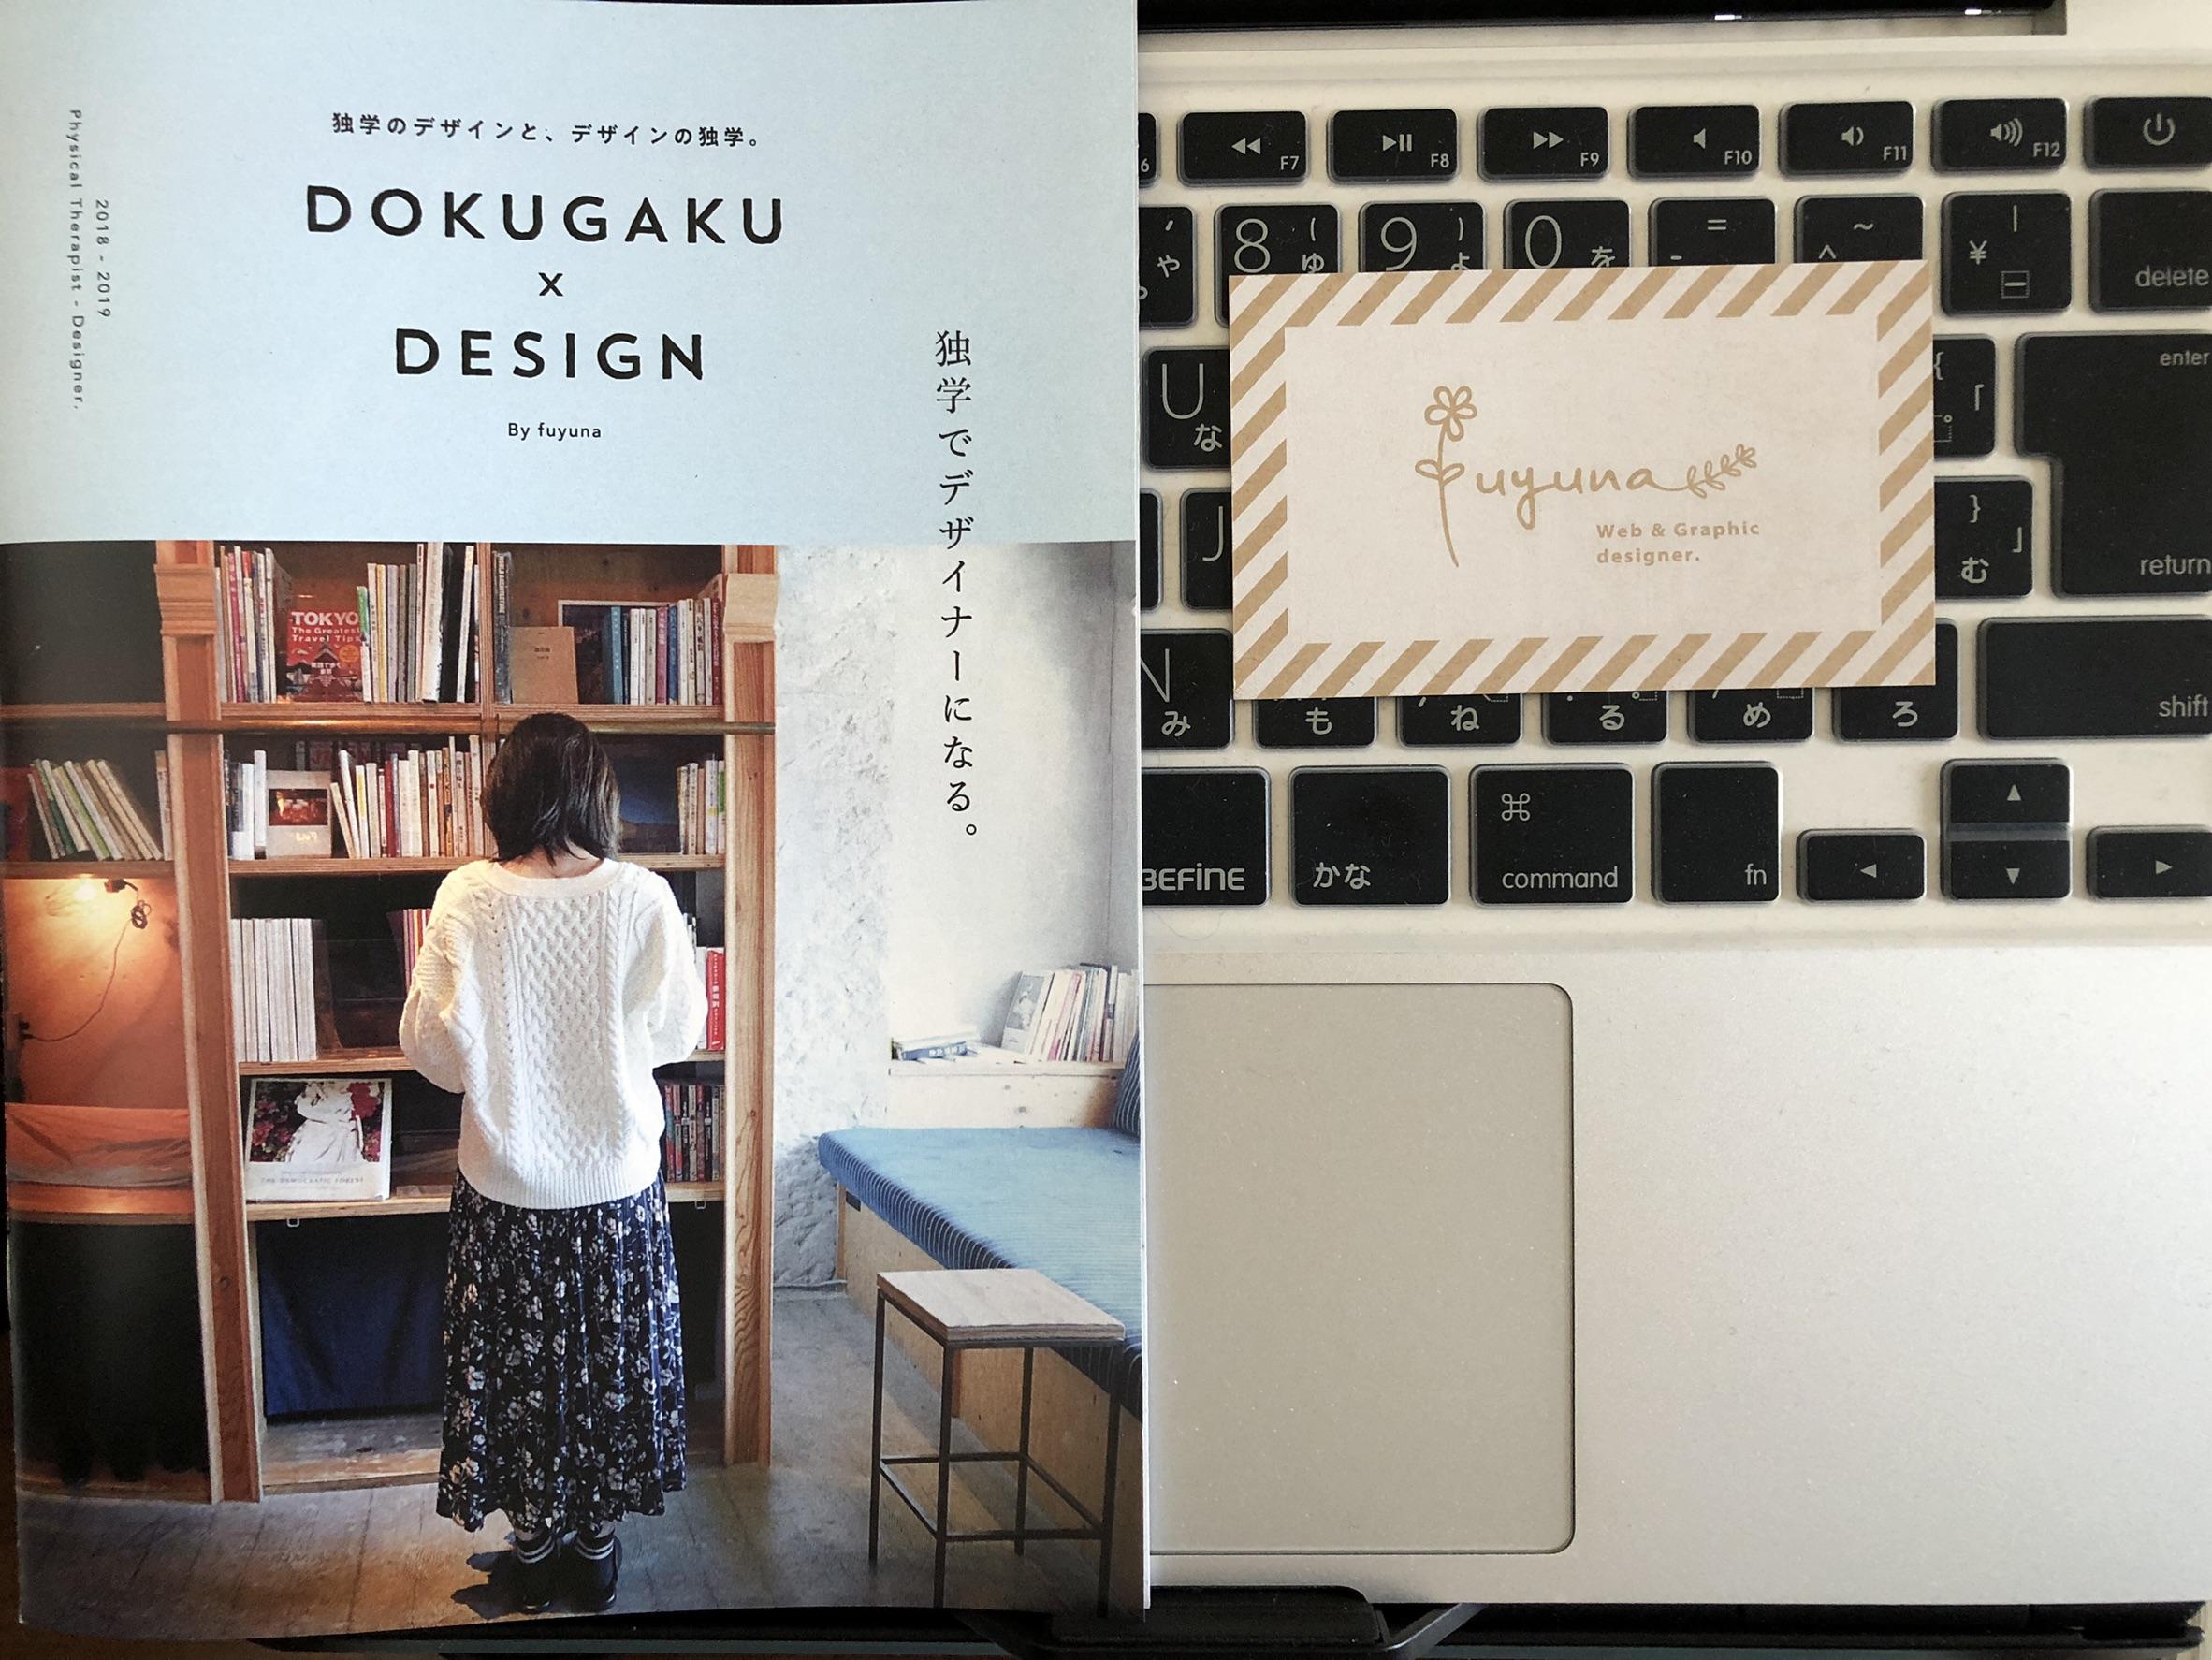 fuyuna 魅せるデザイナー 独学でデザイナーになる